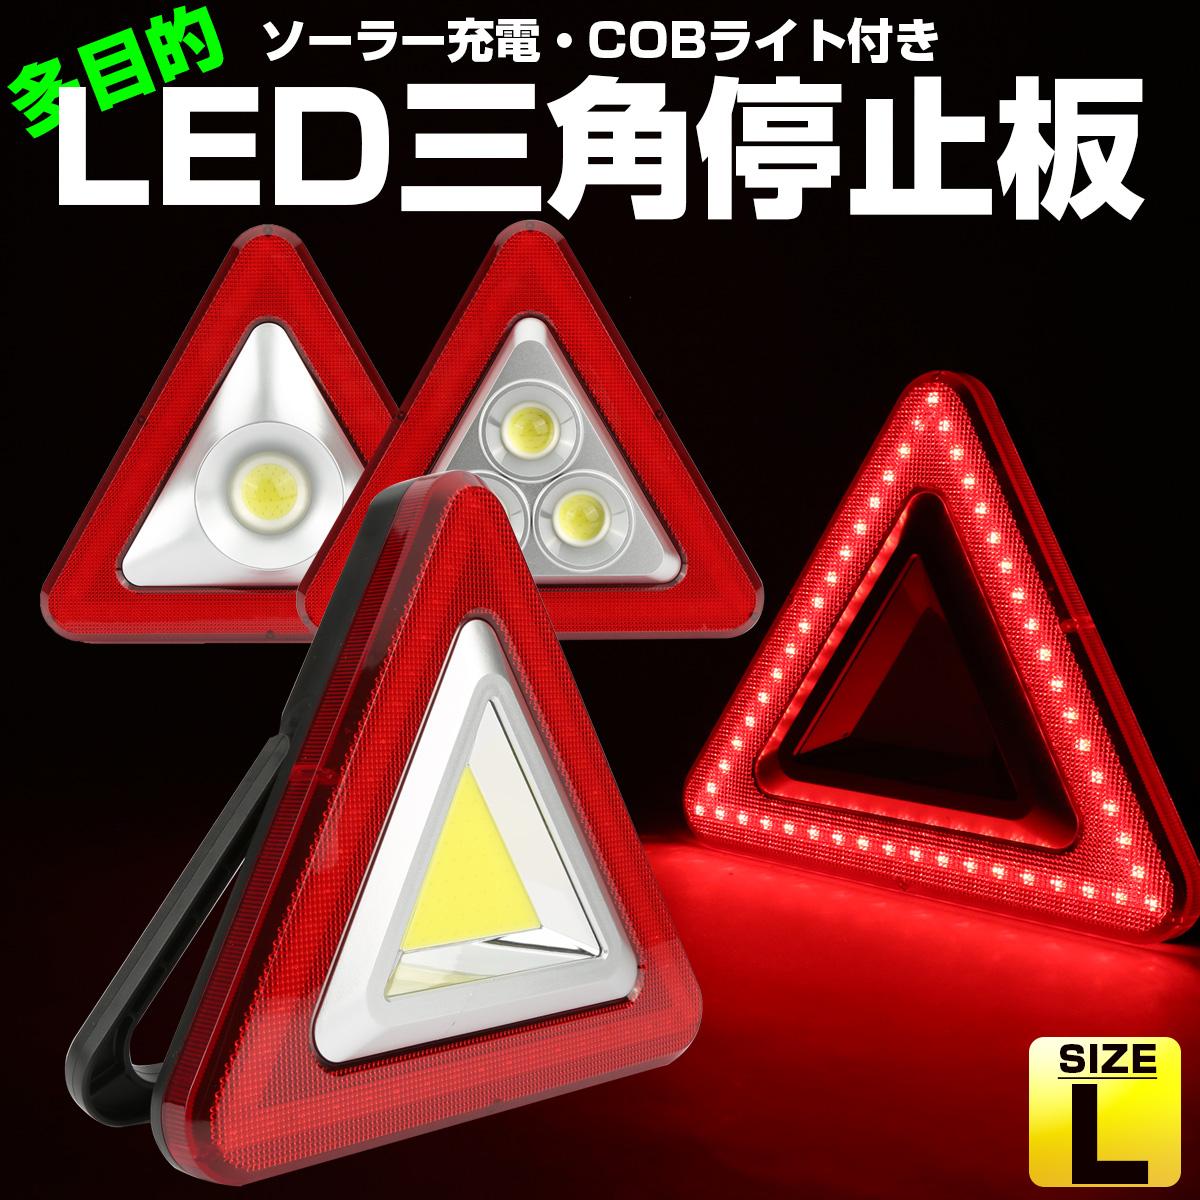 LED 三角停止板 三角表示板 Lサイズ 中央1灯 COBライト 多目的ライト USB充電 ソーラー充電 USB給電ポート Y-111-113